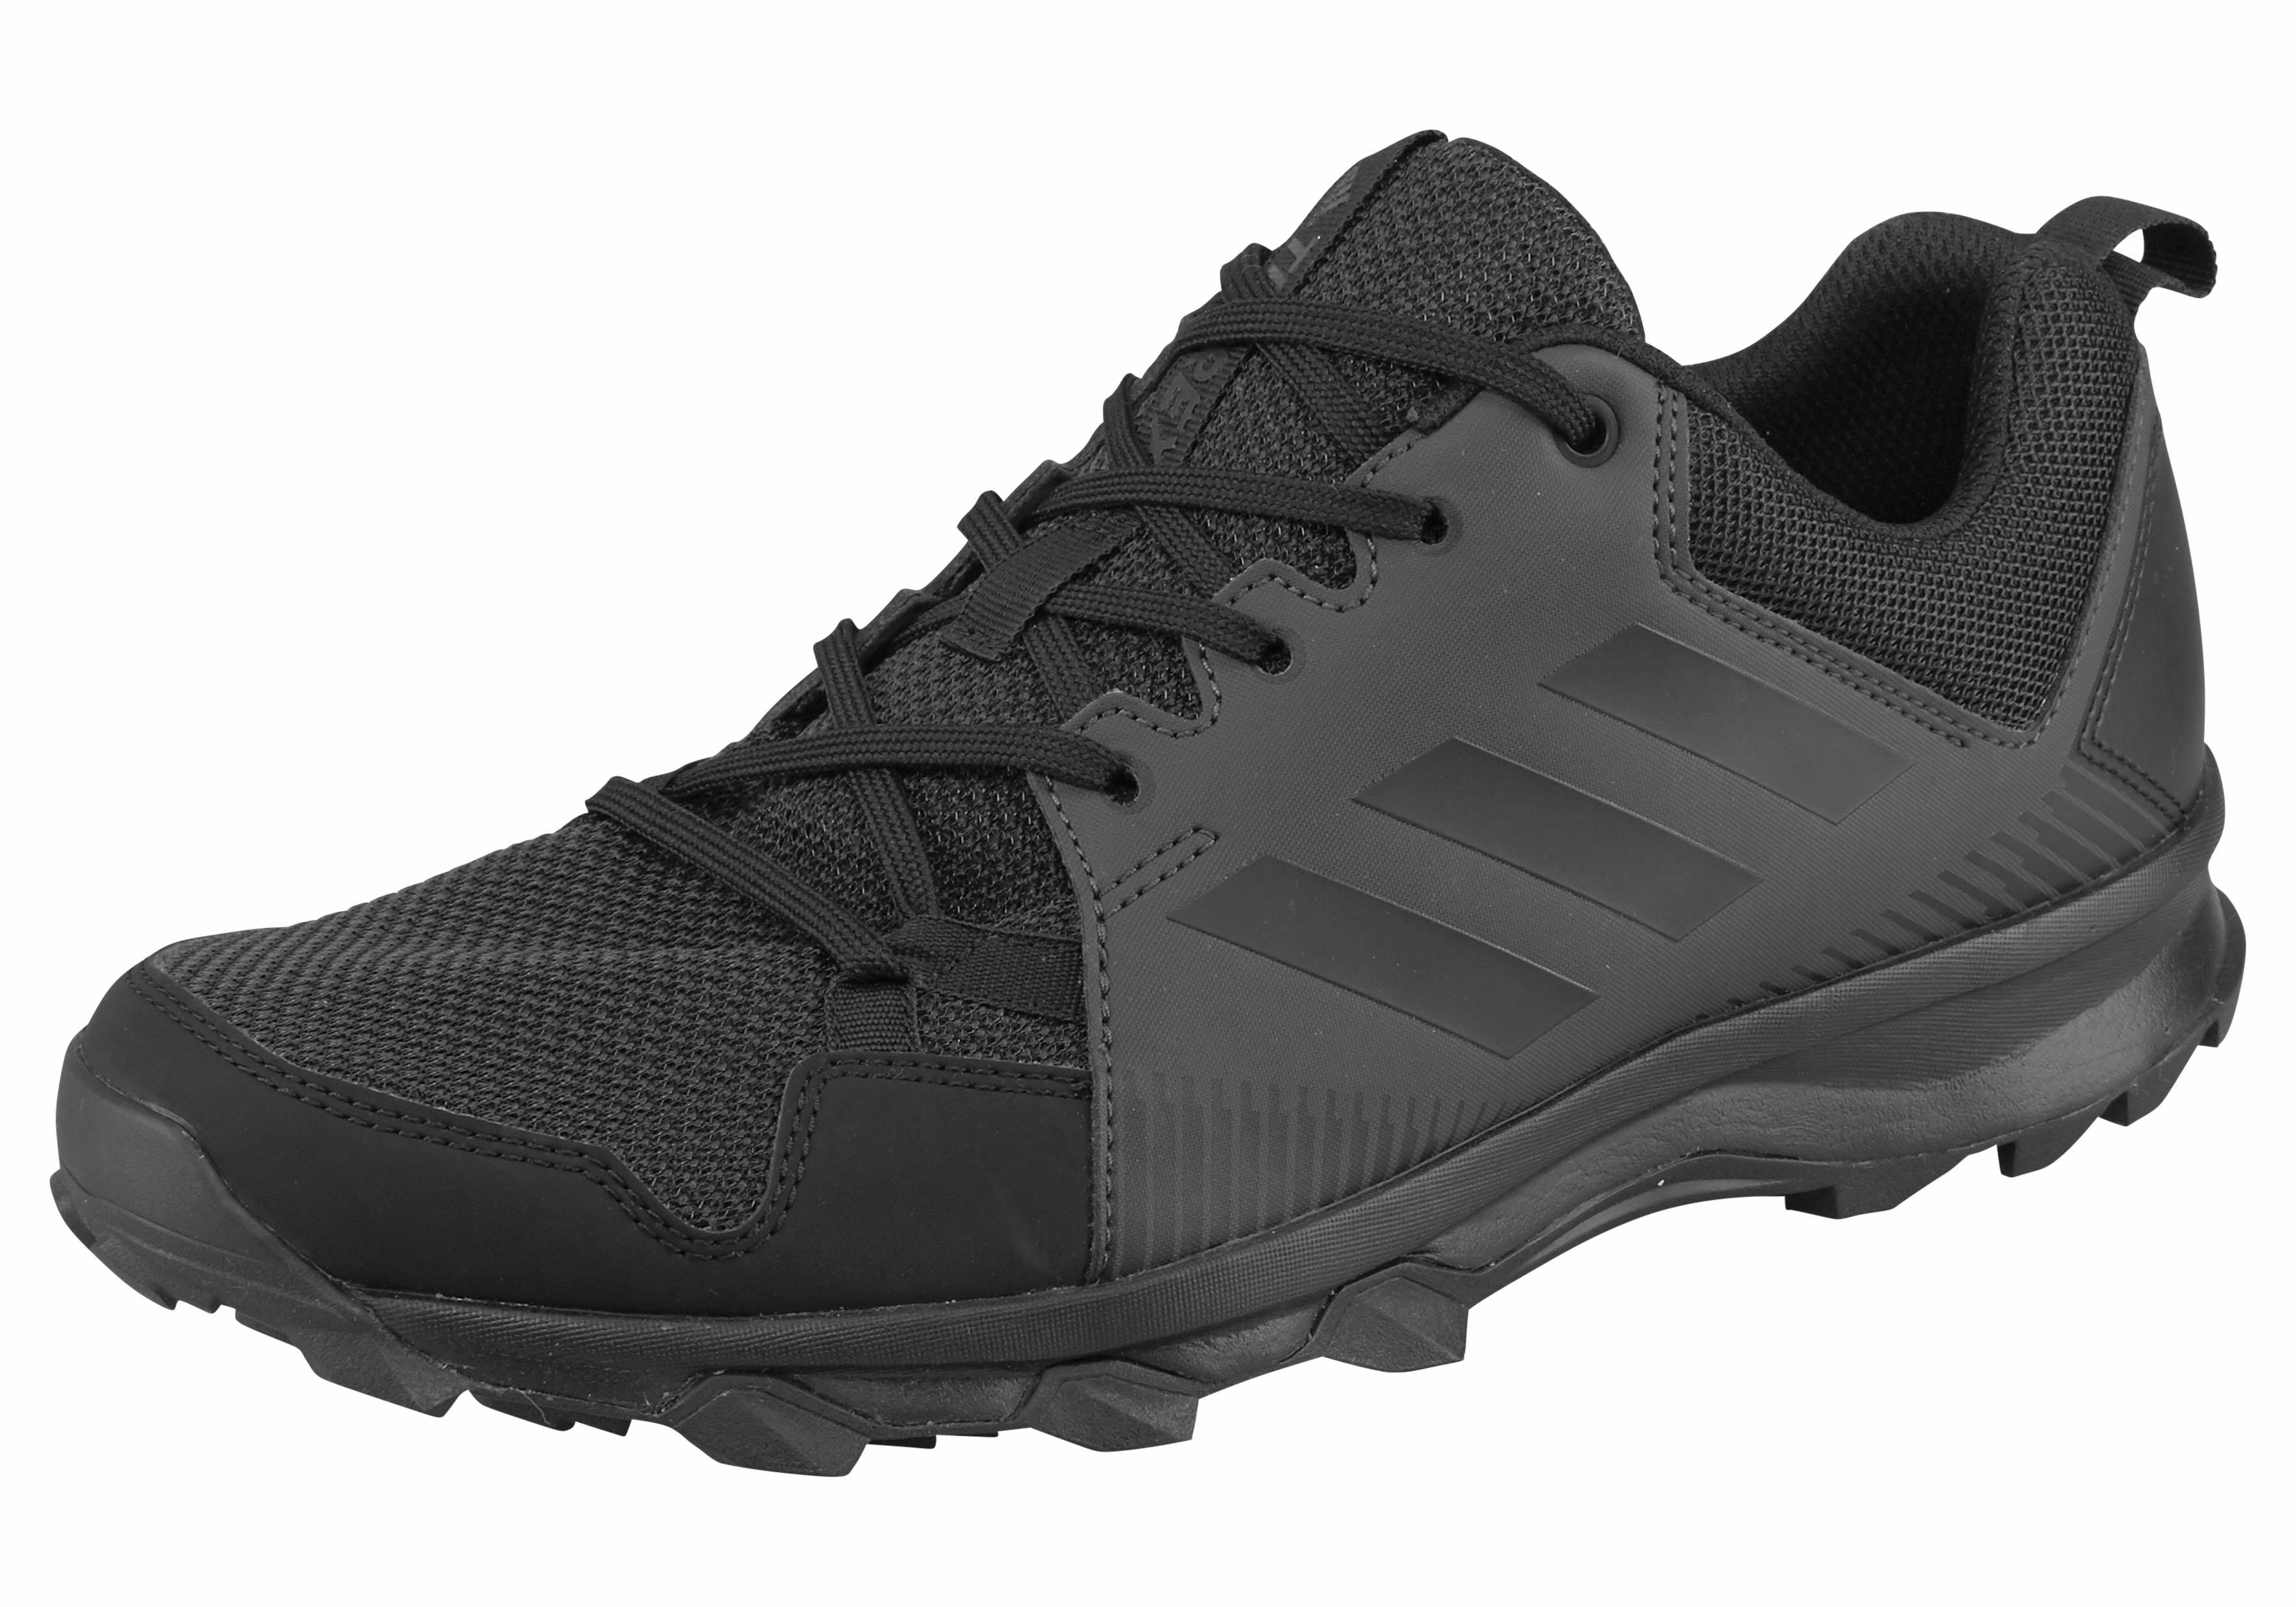 adidas Performance outdoorschoenen »Terrex Tracerocker« - verschillende betaalmethodes